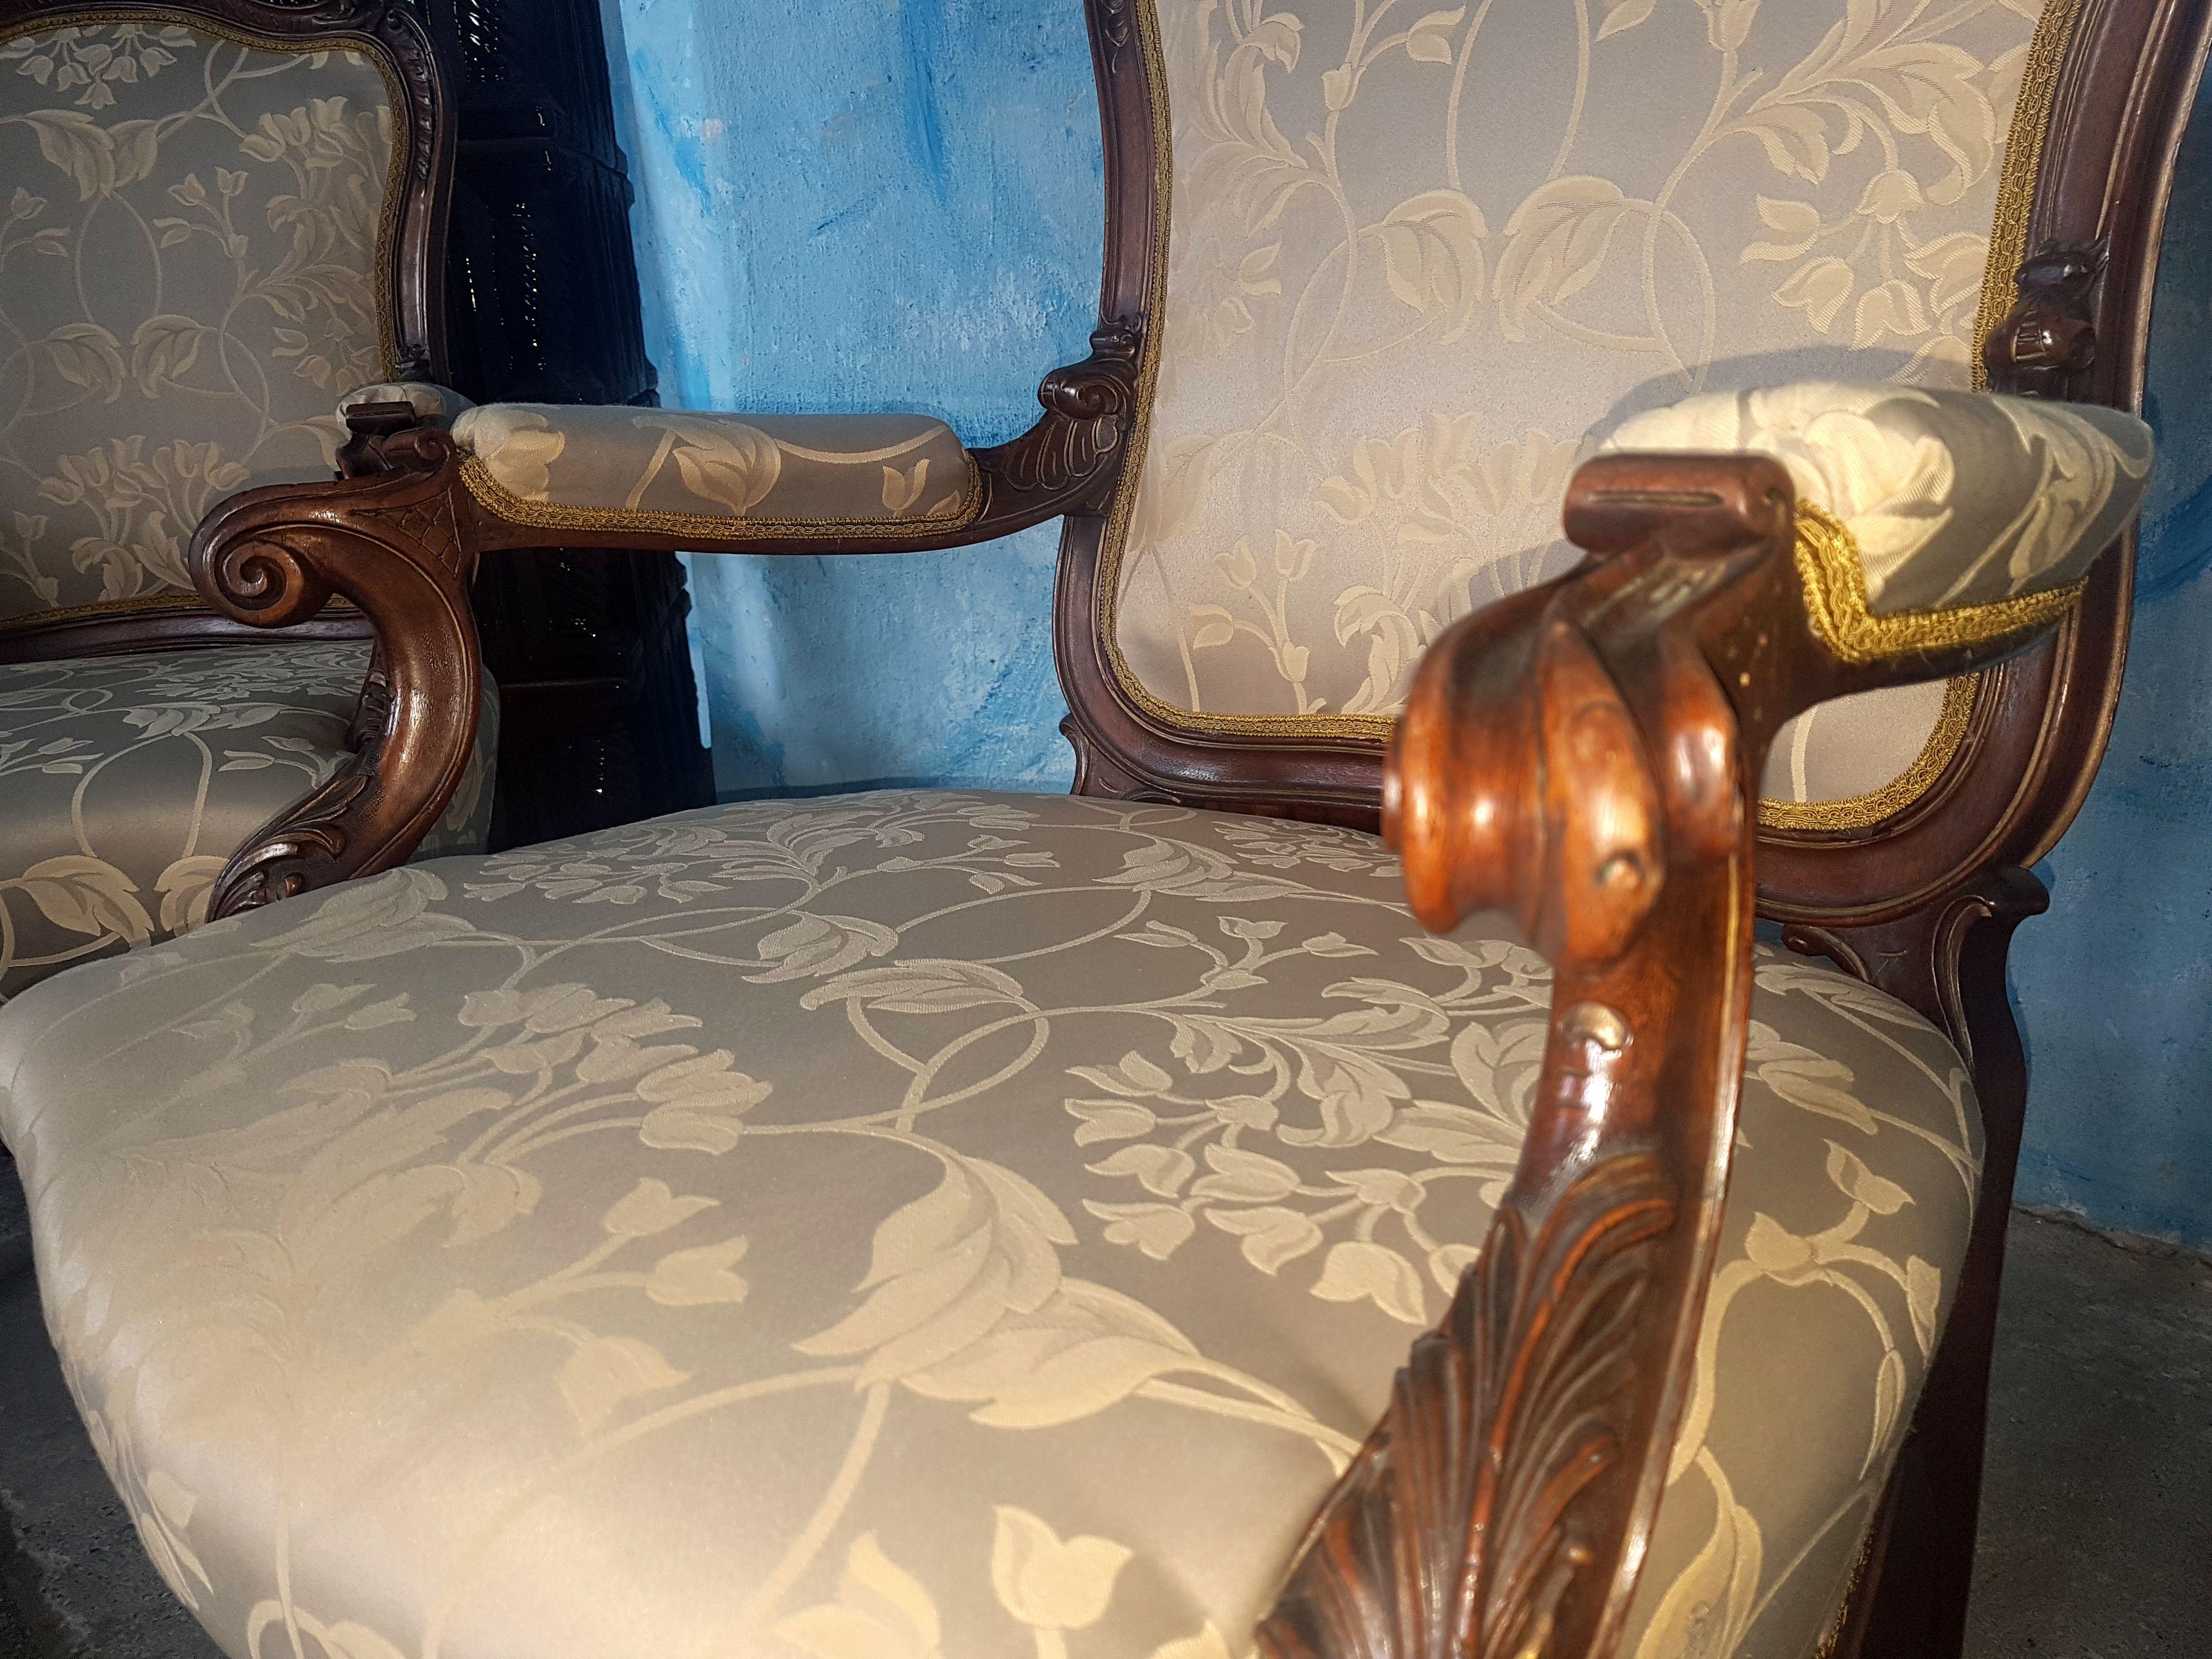 barokk fotel, eladó bútor | Bútor, Antik, Antik bútorok